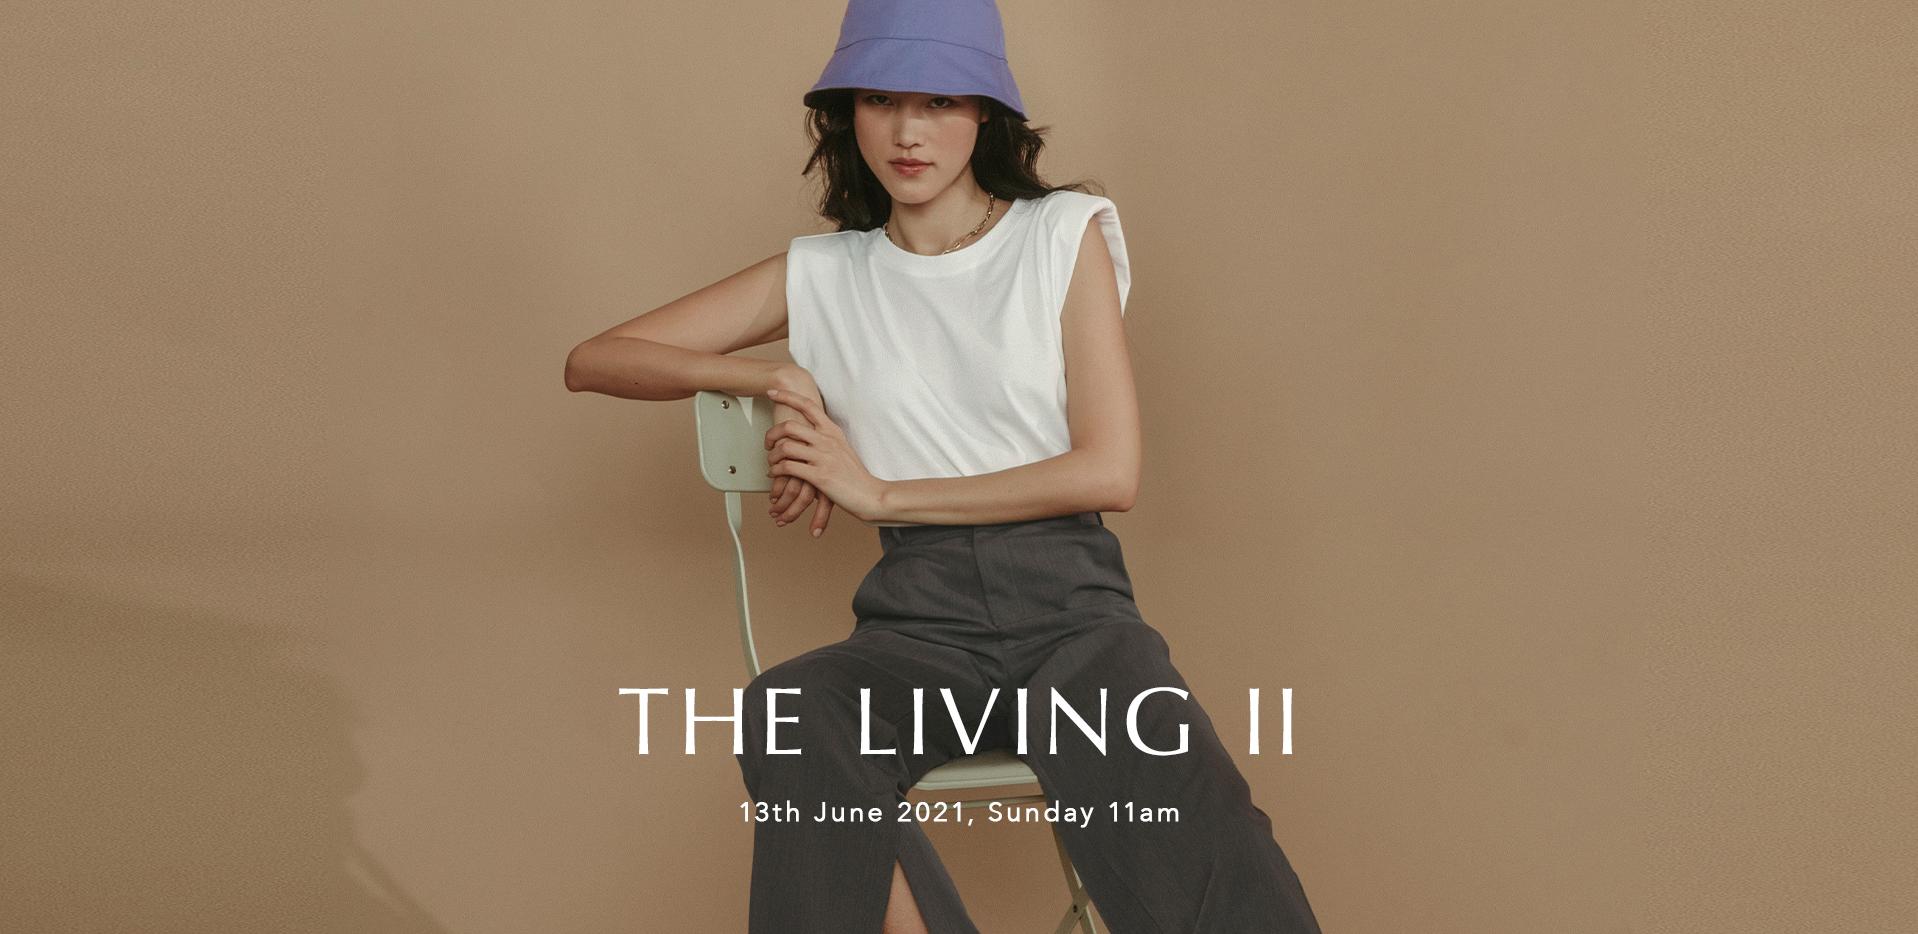 THE LIVING II